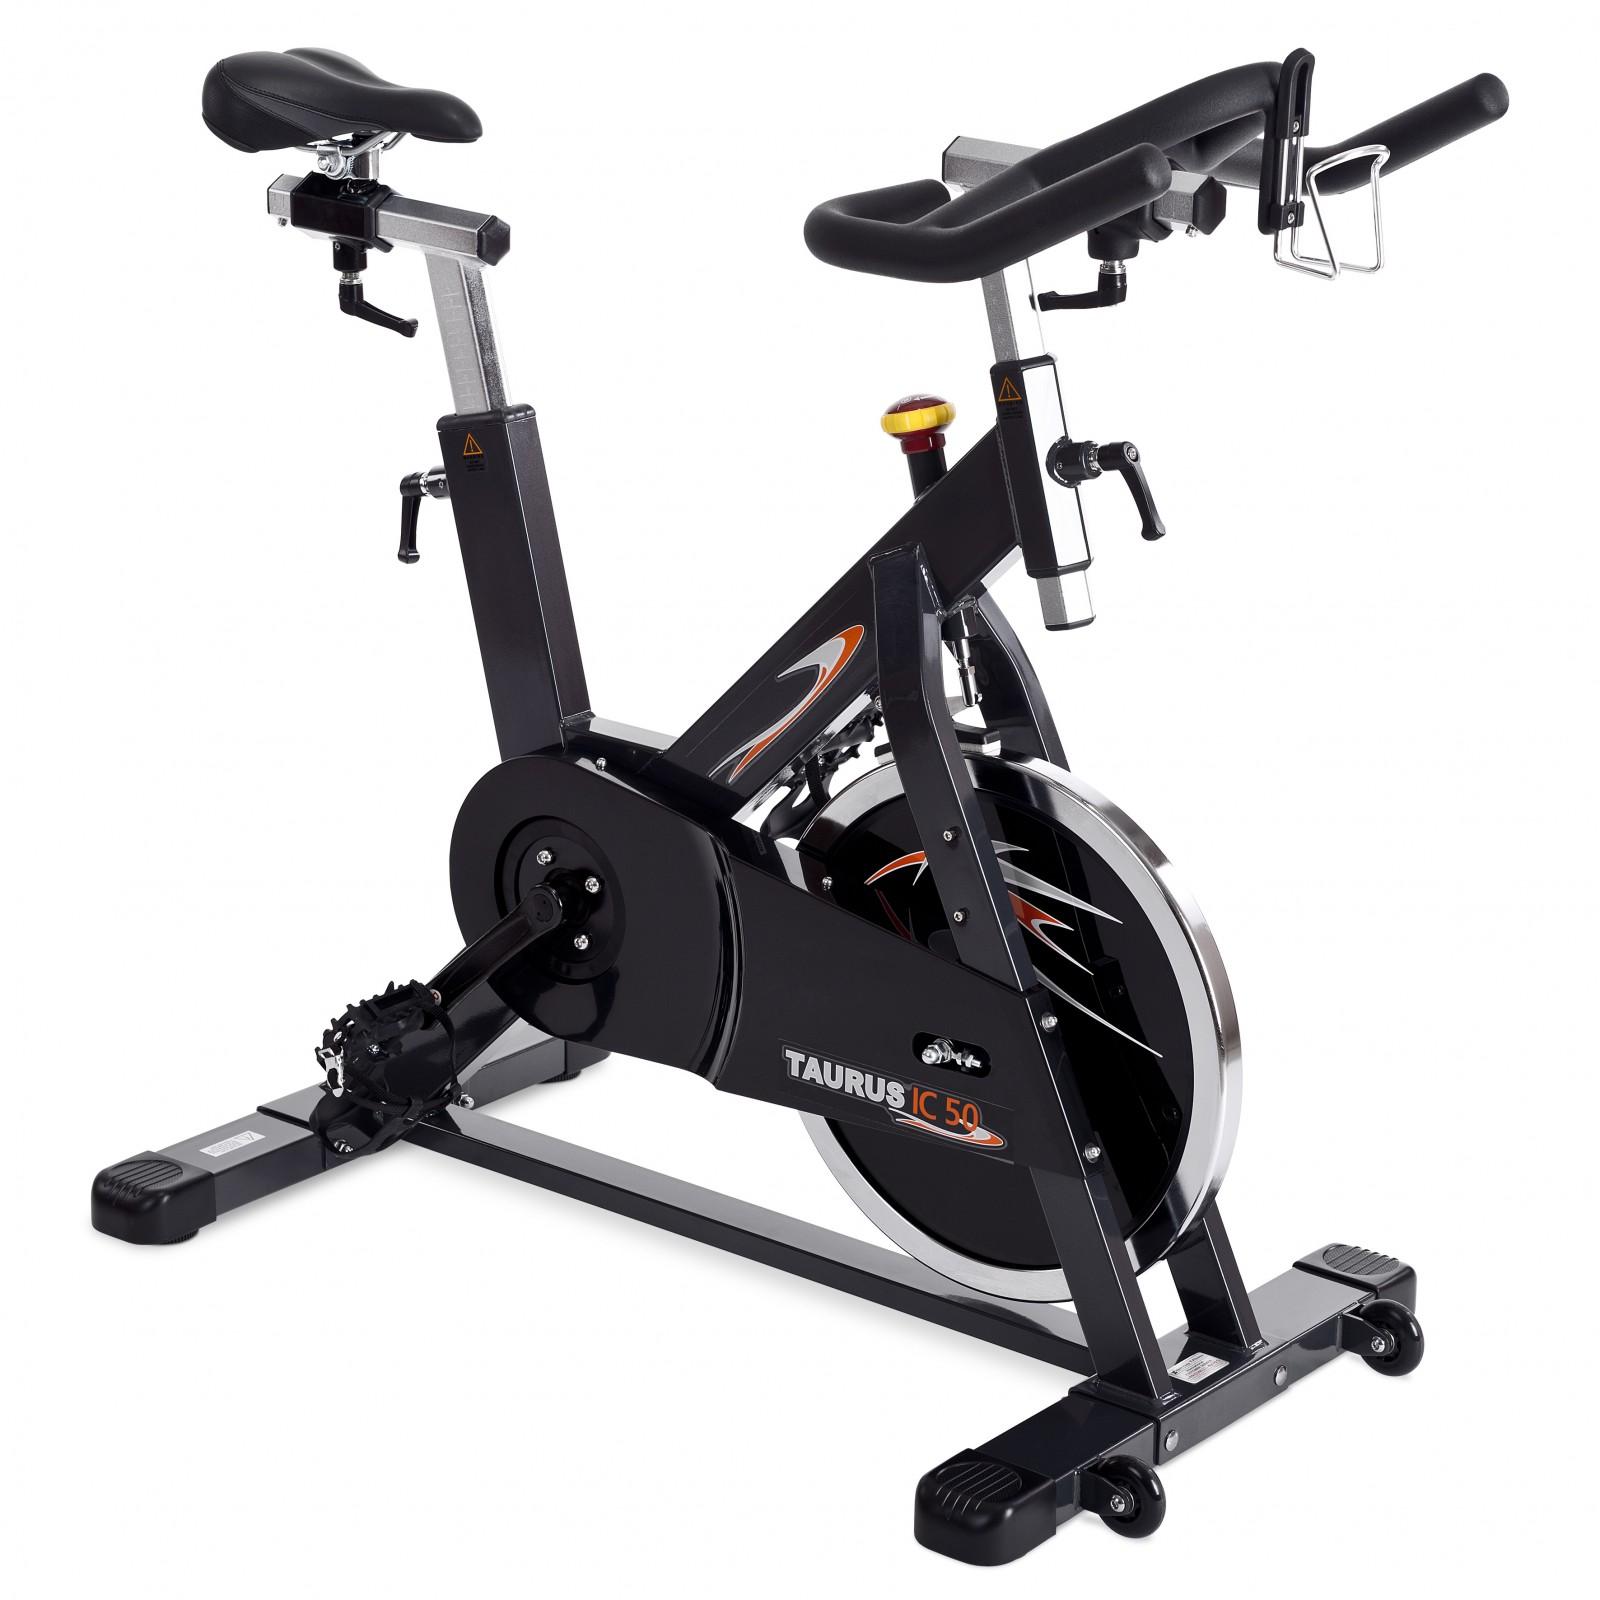 taurus indoor bike ic50 indoor cycling magazin. Black Bedroom Furniture Sets. Home Design Ideas